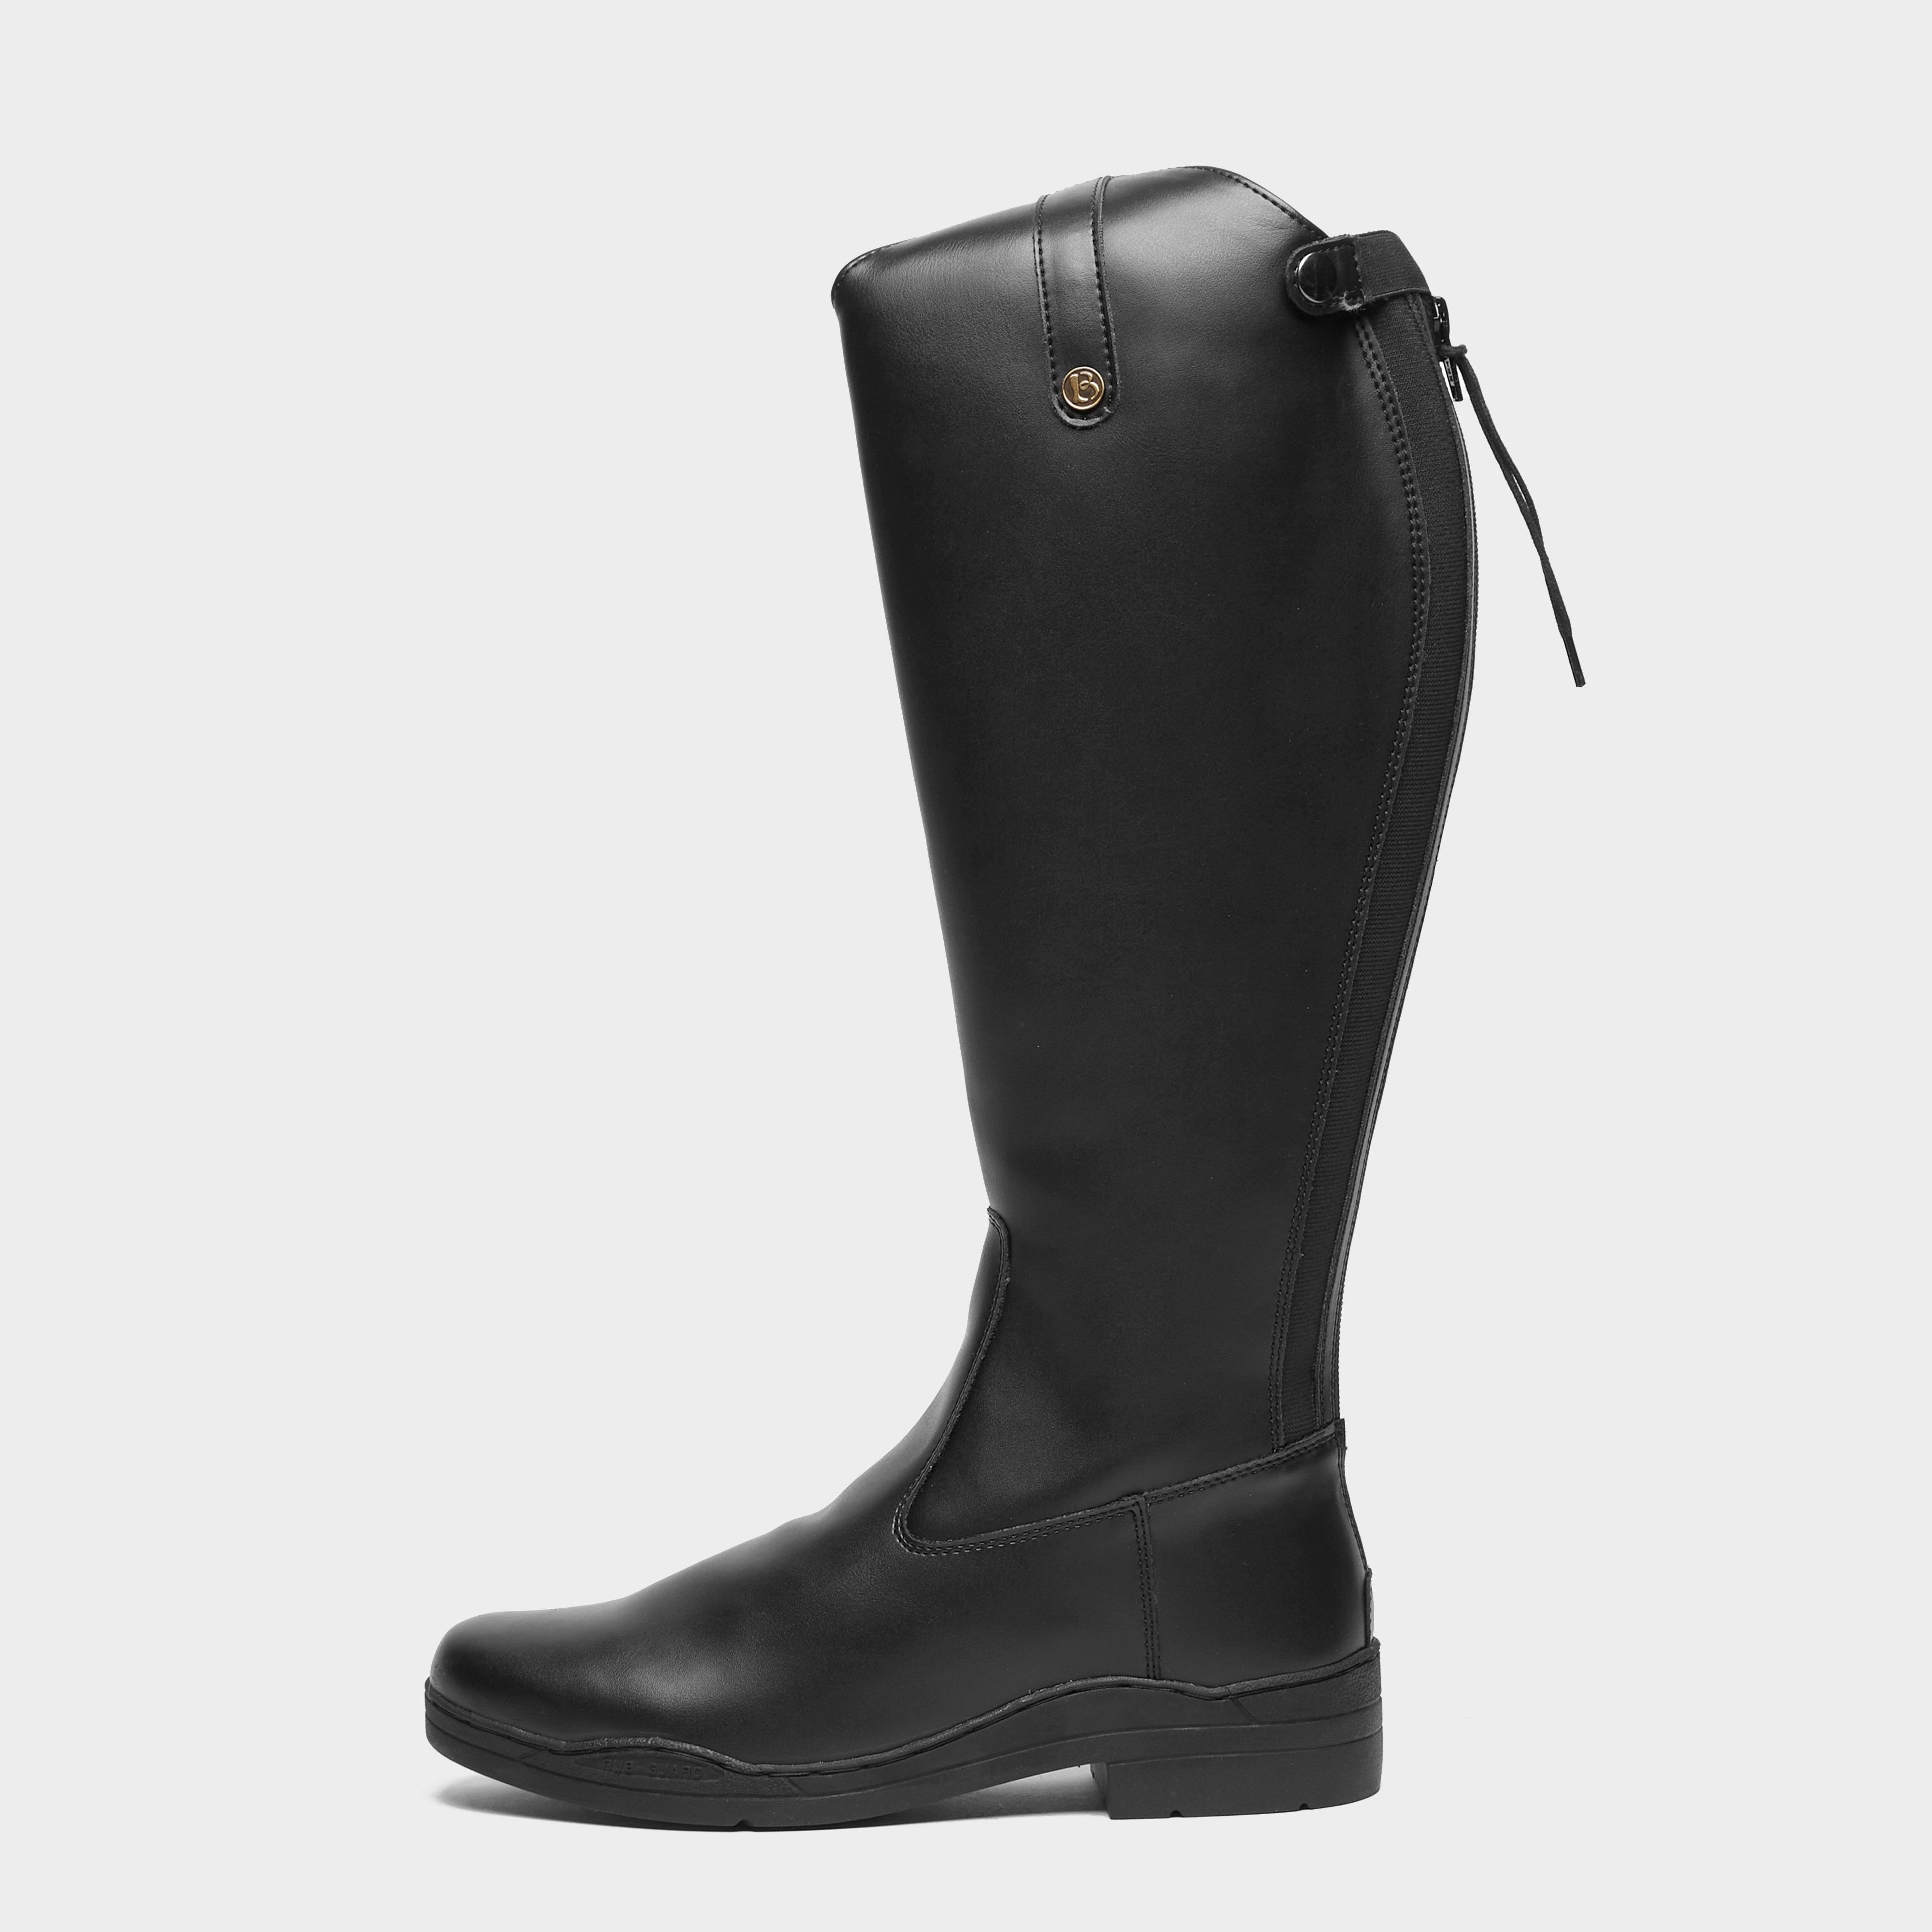 Brogini Women's Moderna Synthetic Dress Riding Boots - Black/Black, Black